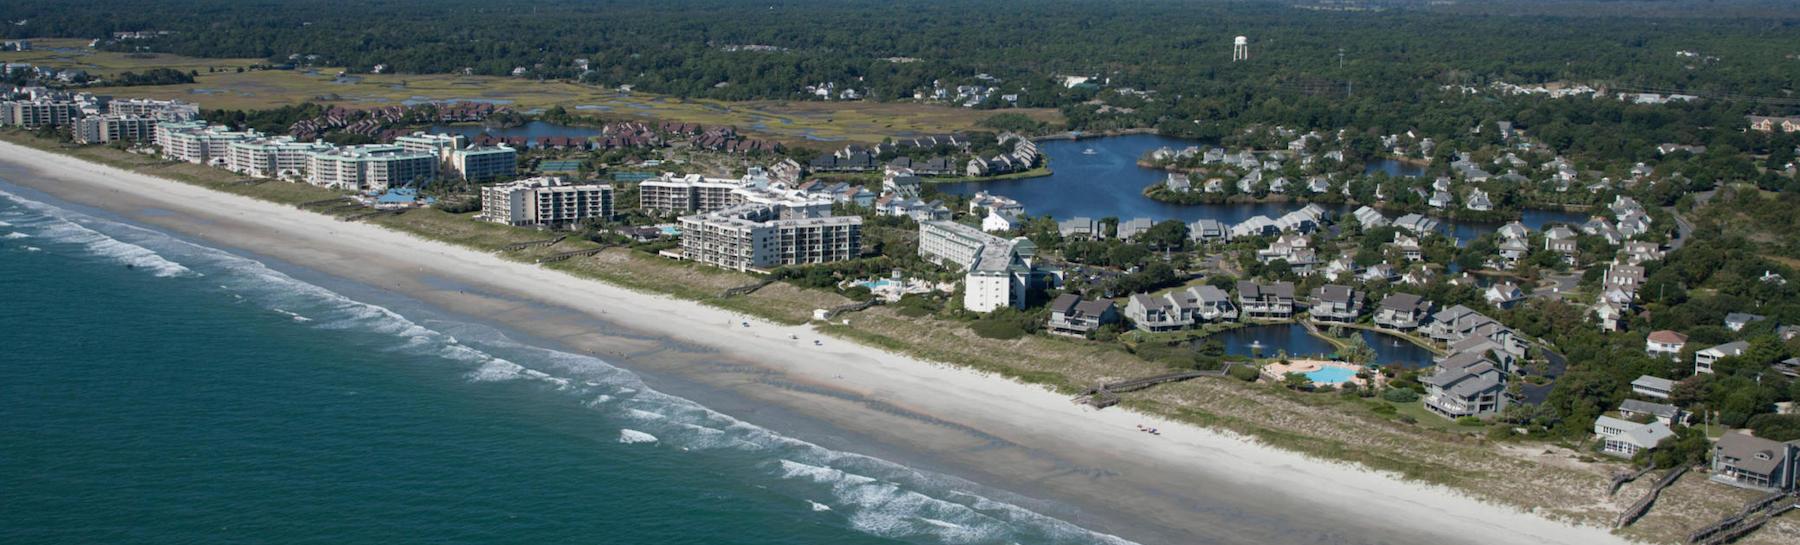 Litchfield Beach & Golf Resort: Southern Comfort in Pawleys Island, S.C.